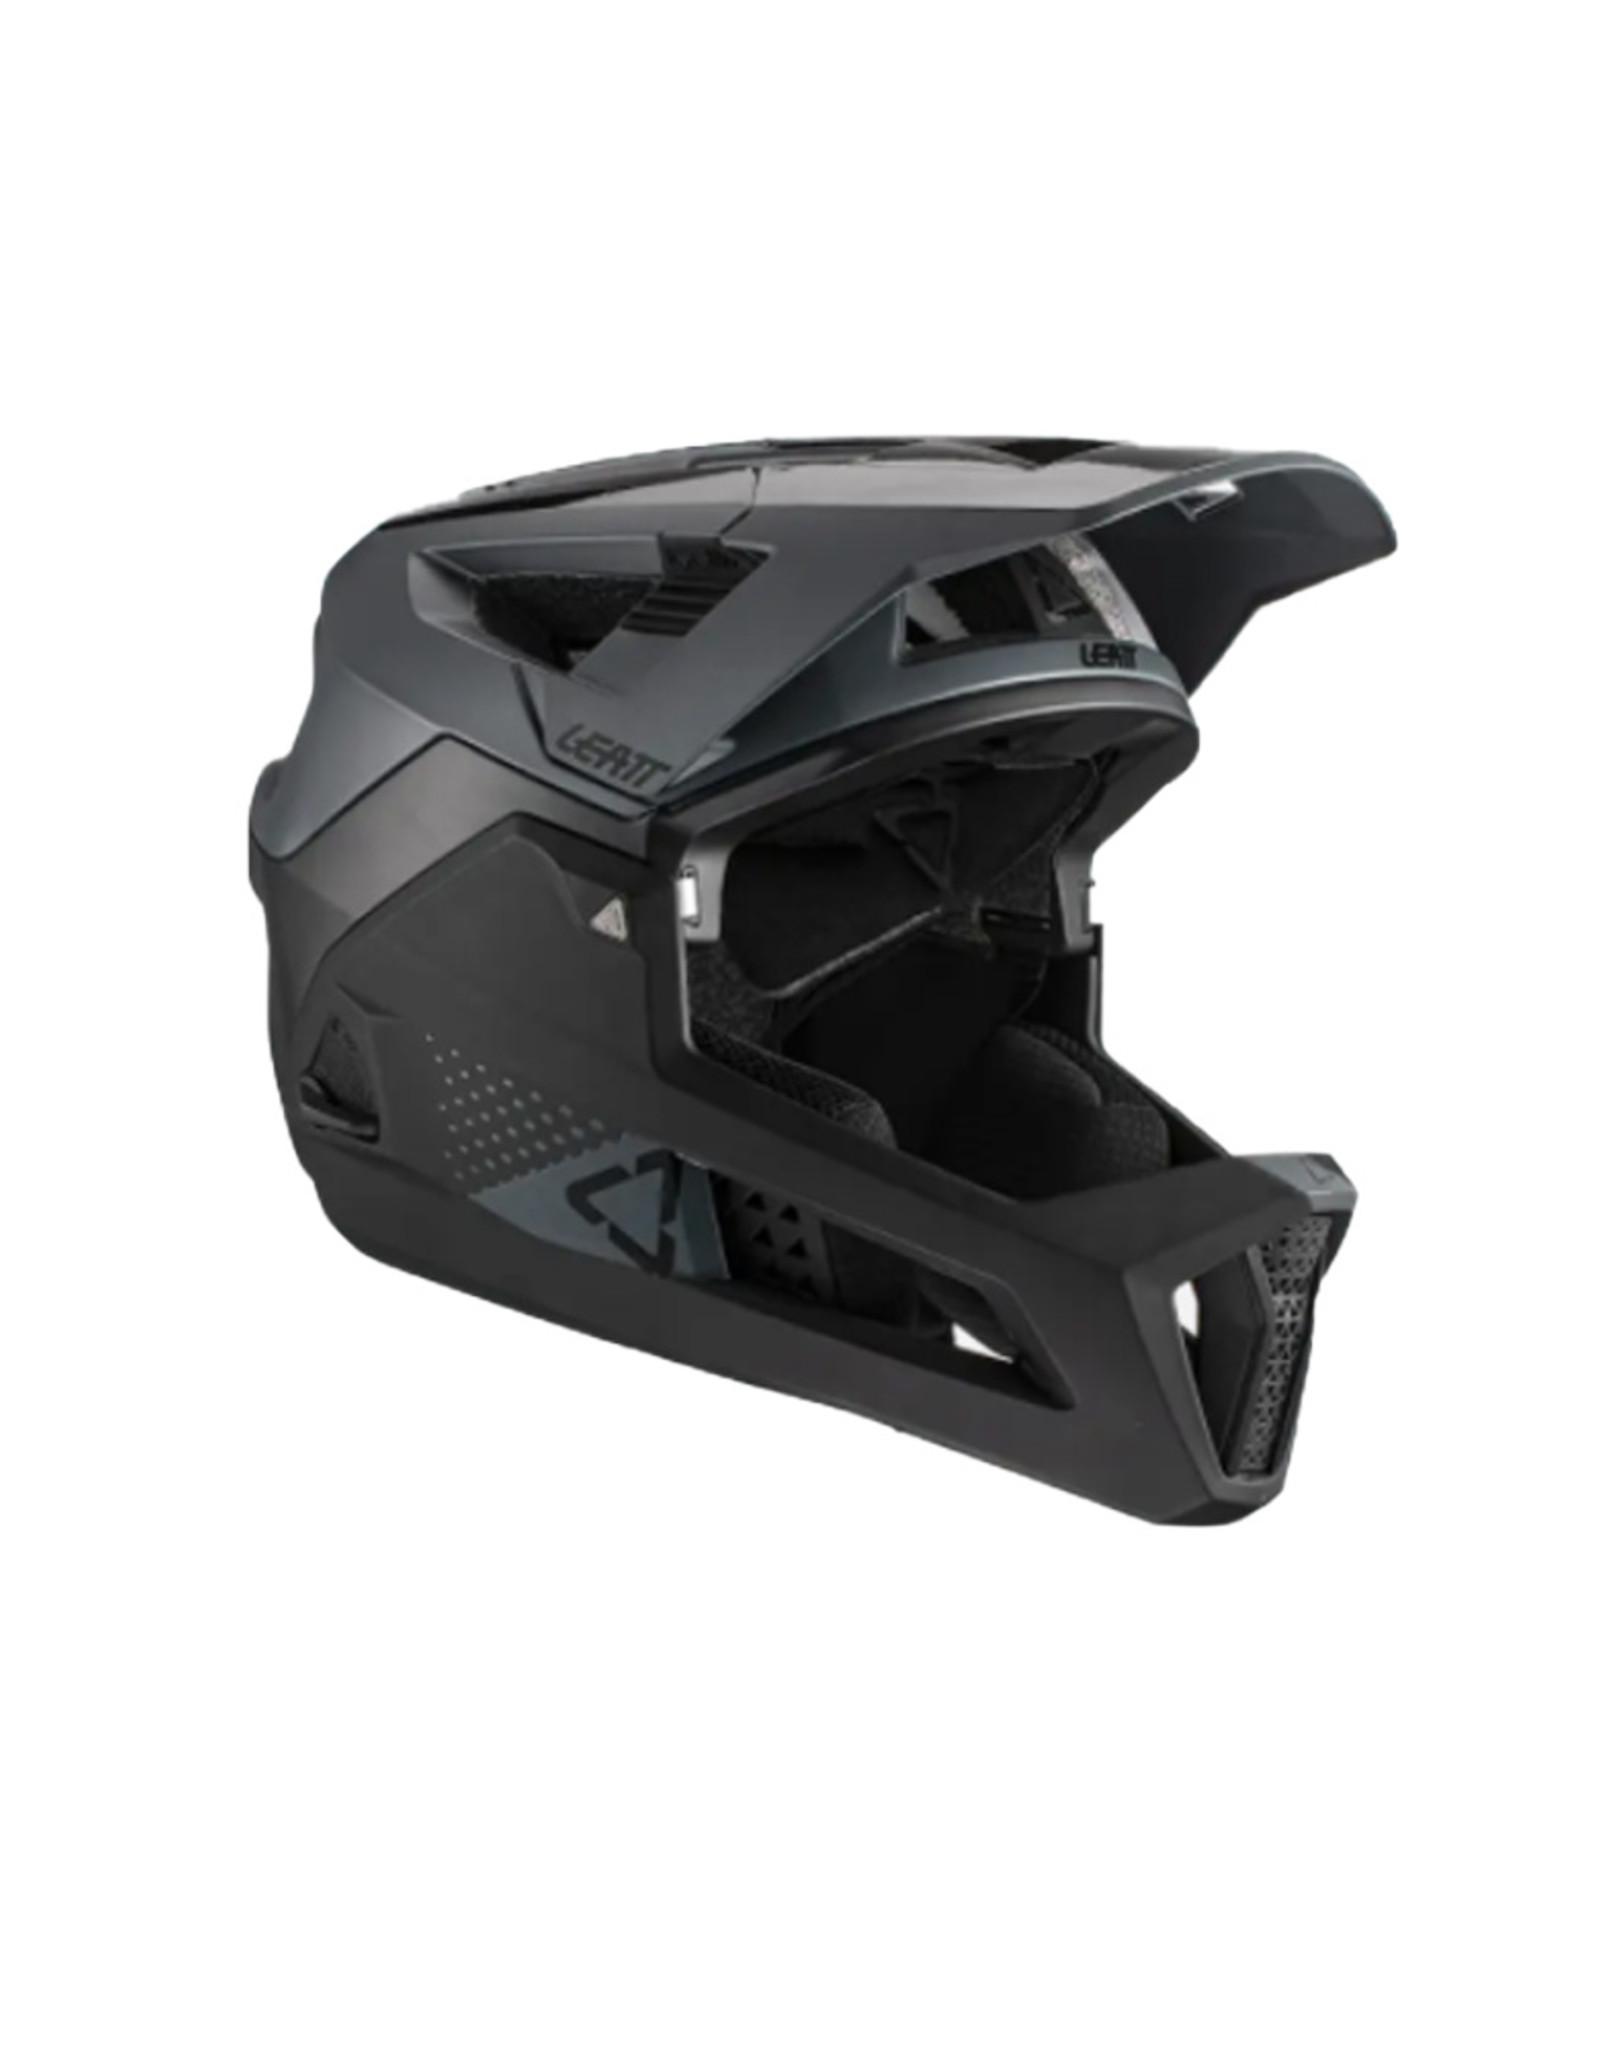 Leatt Casque Leatt MTB 4.0 Enduro